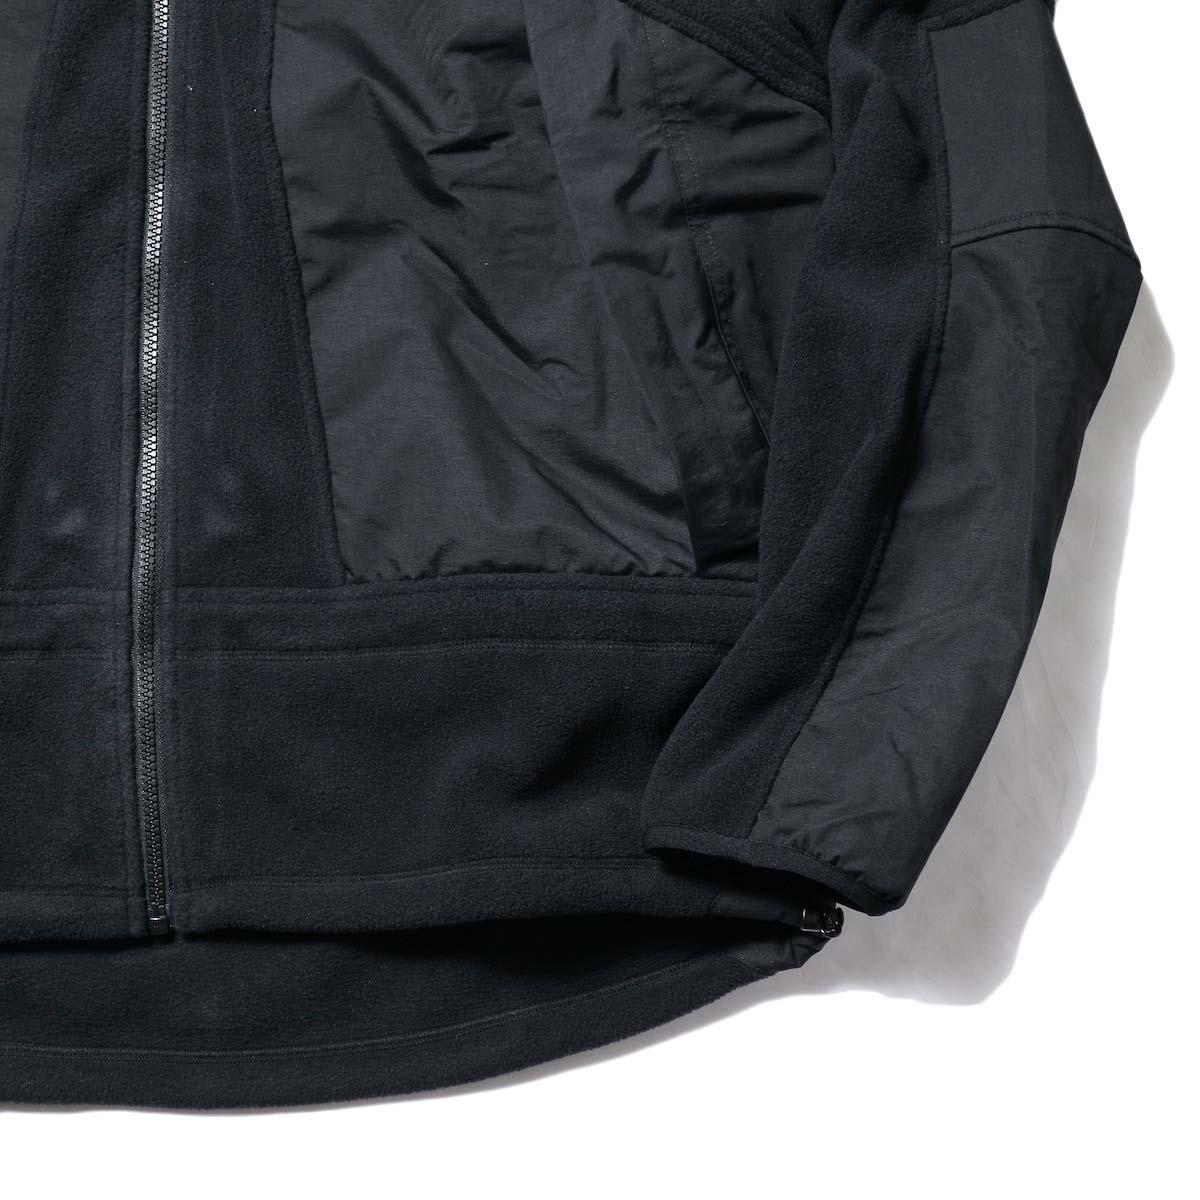 Marmot Histric Collection / Alpinist Tech Sweater (Black×Black)袖、裾